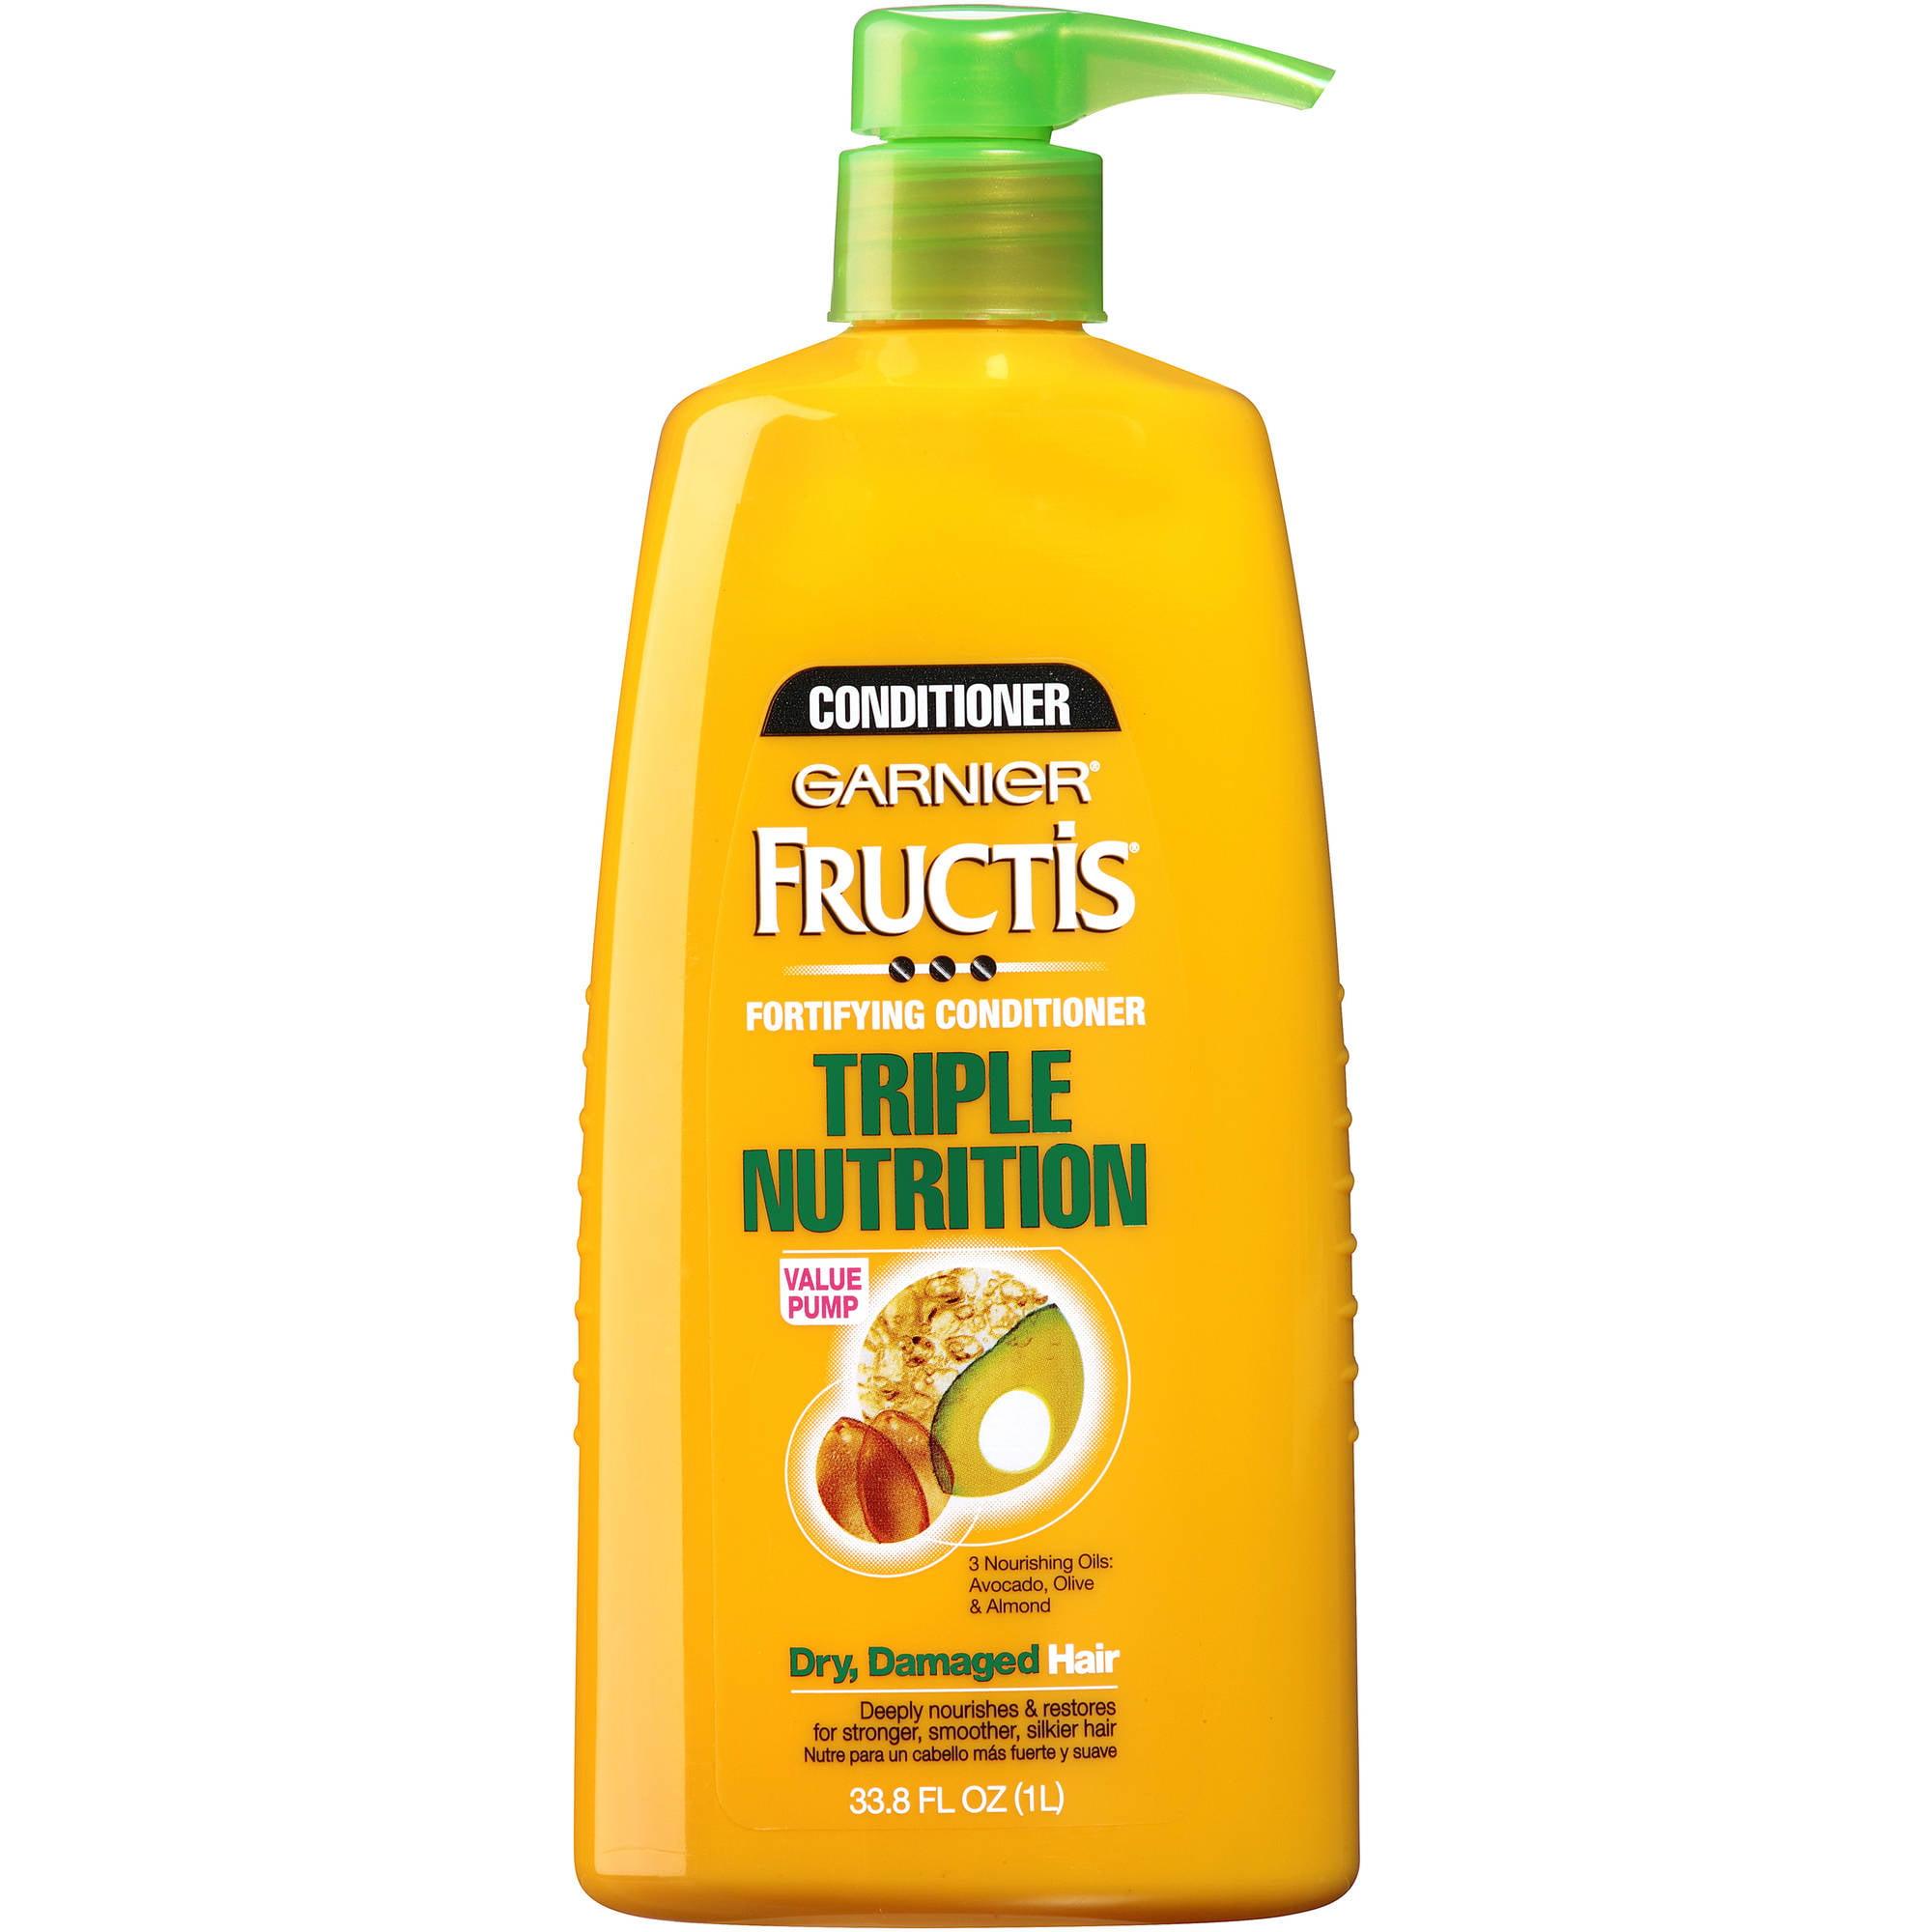 Garnier Fructis Triple Nutrition Fortifying Conditioner, 33.8 fl oz